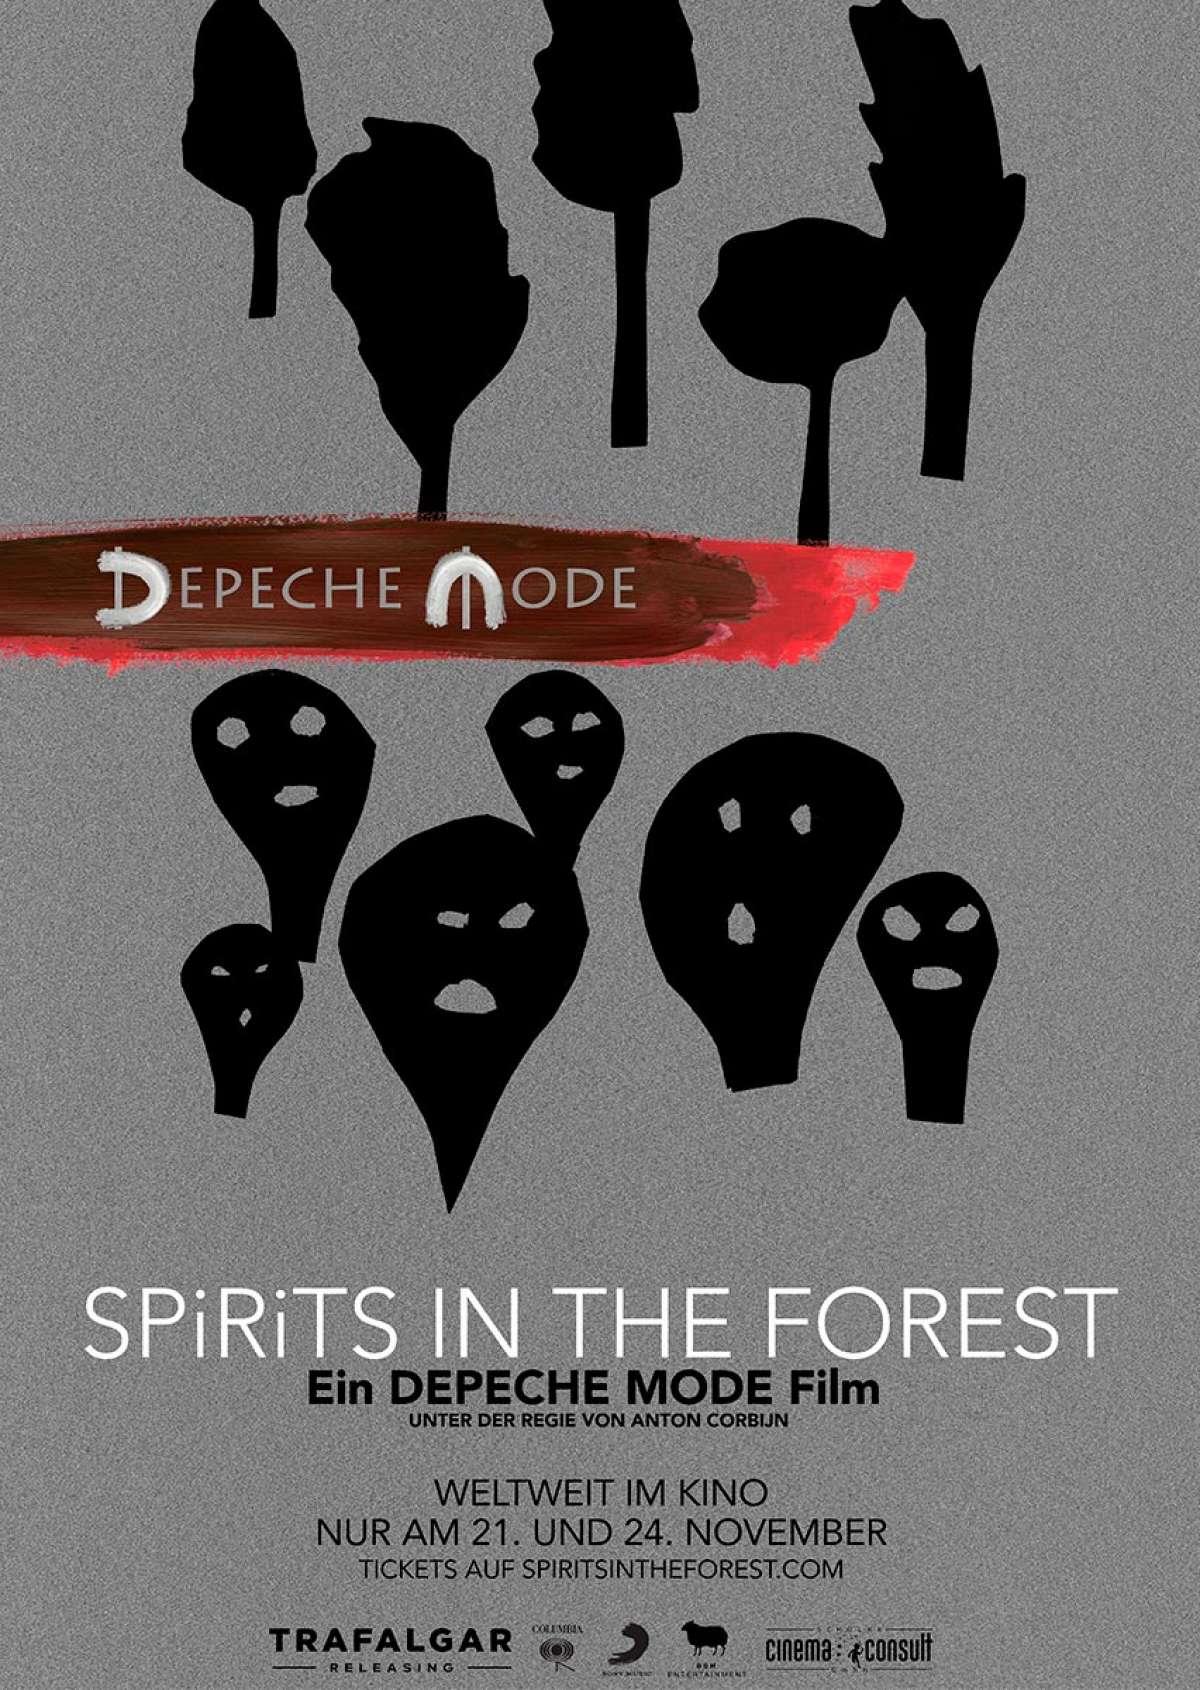 Depeche Mode: SPIRITS in the Forest - Depeche Mode - Cine-Royal  - Fritzlar